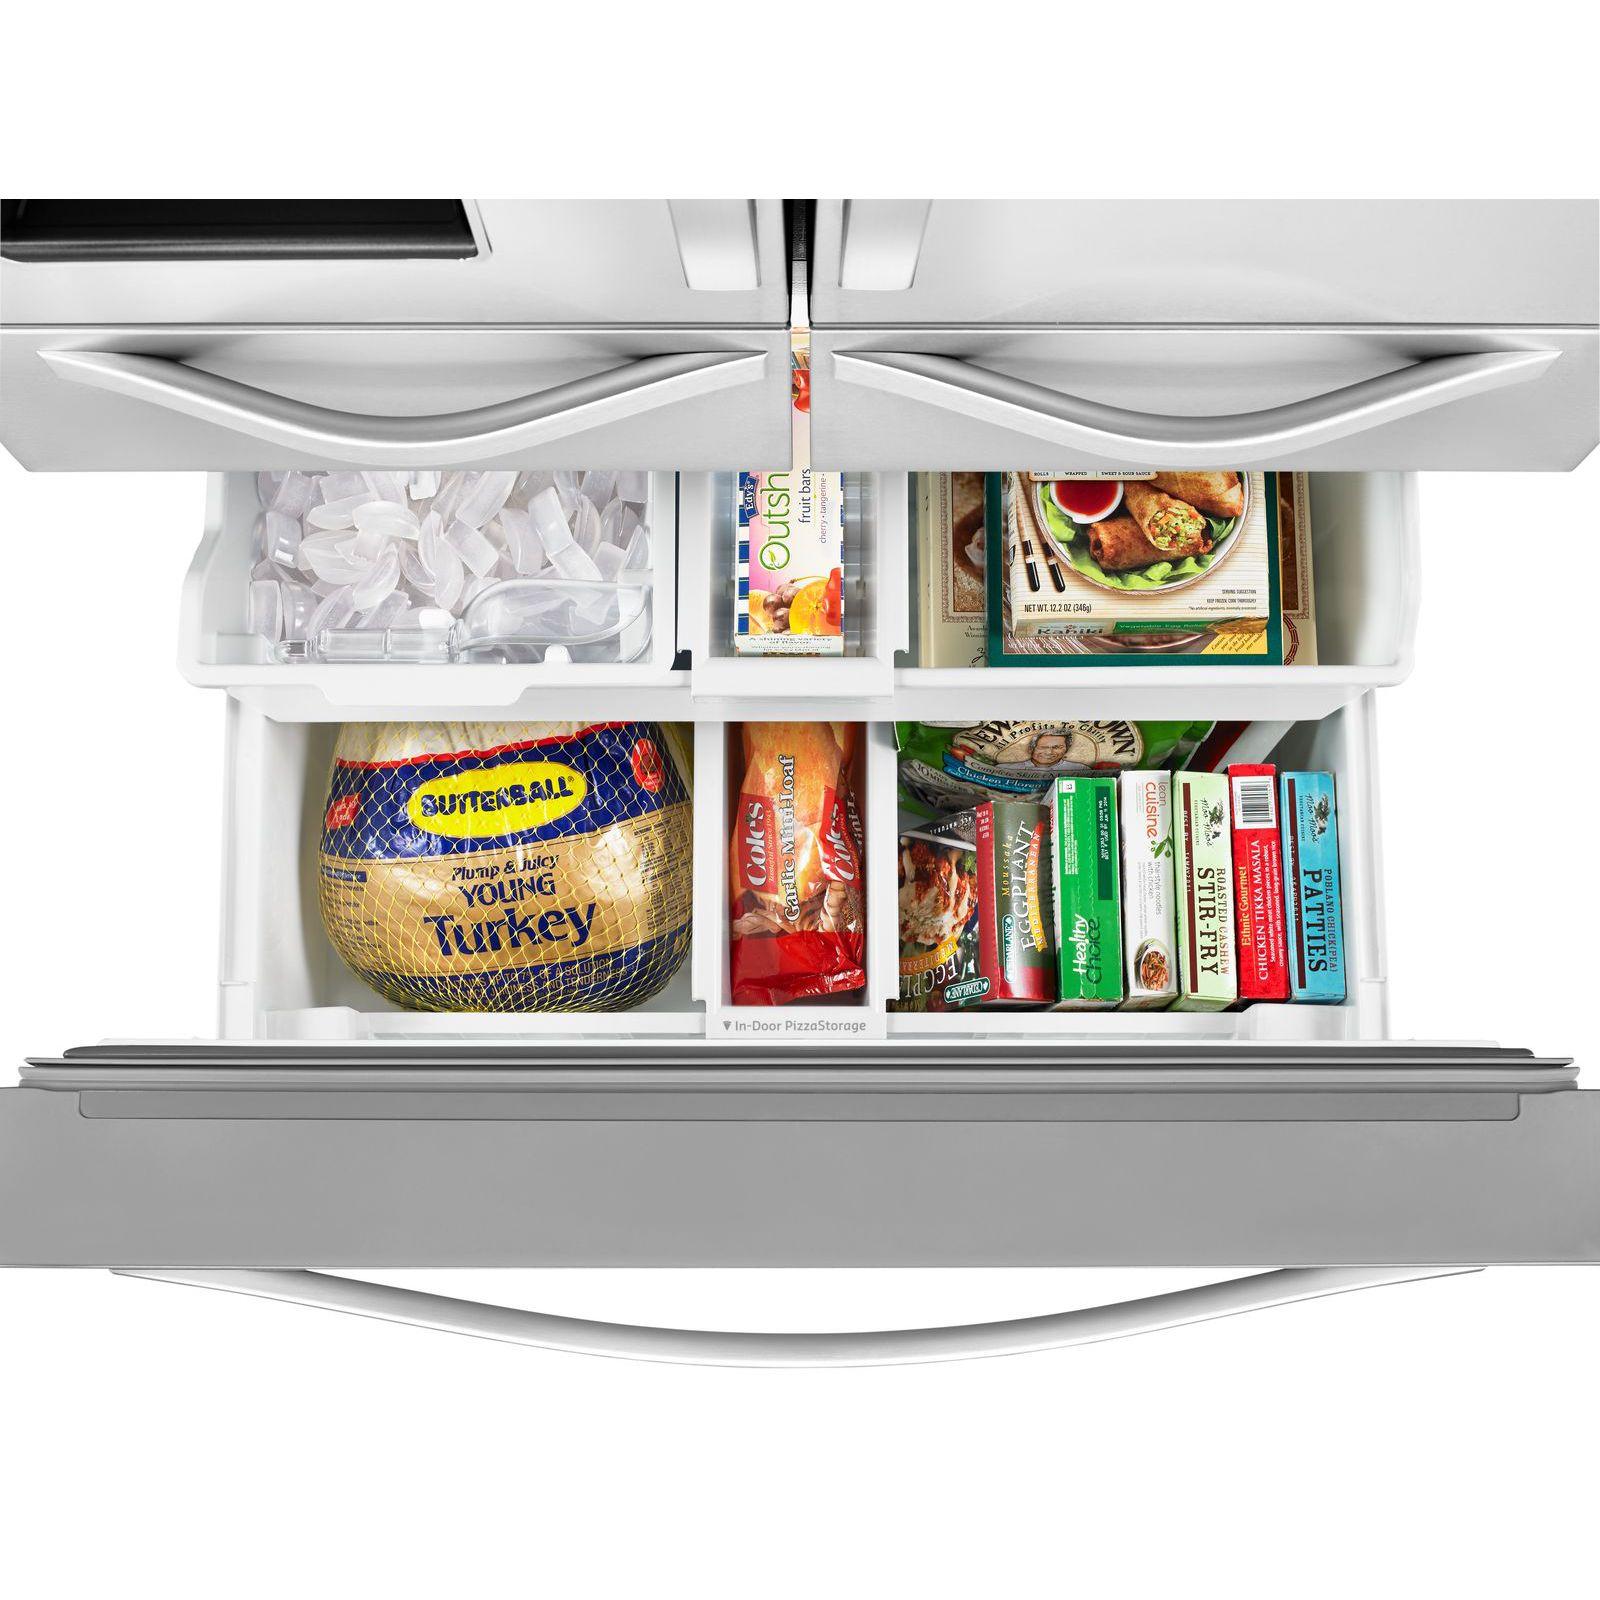 Whirlpool WRV986FDEM 26 cu. ft. French Door Bottom Freezer Refrigerator - Stainless Steel